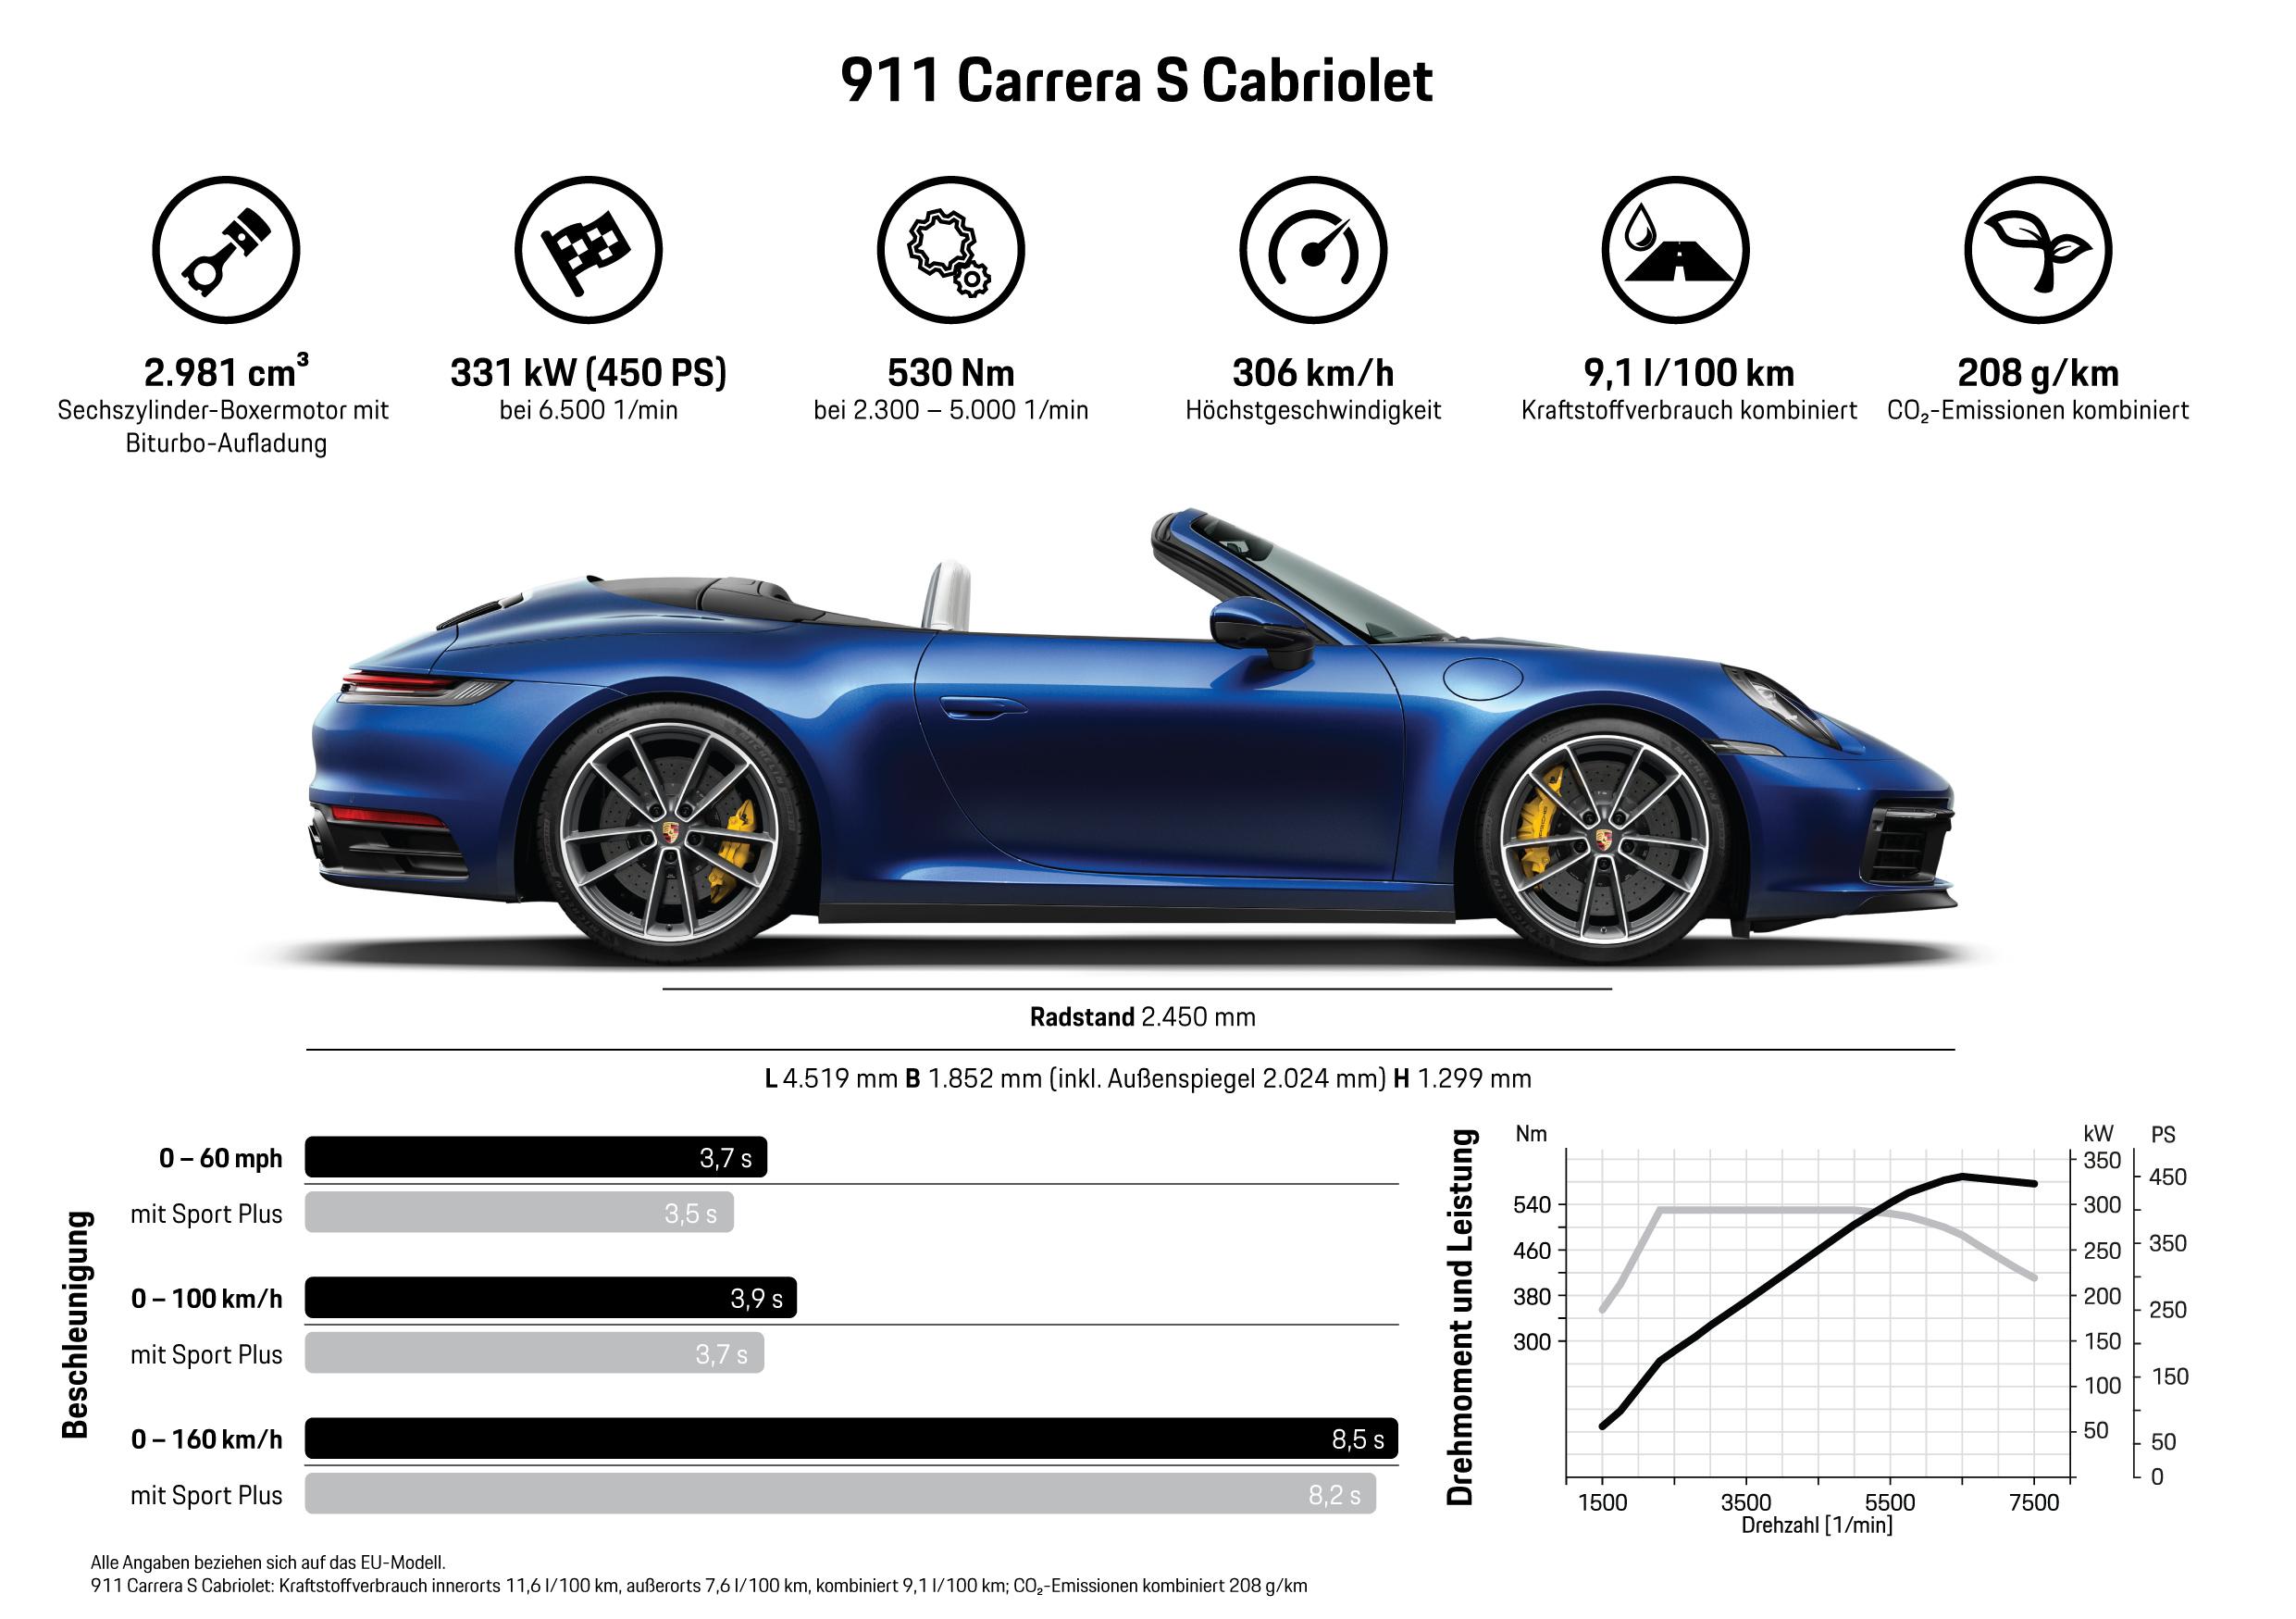 911 Carrera S Cabriolet, Infografik, 2019, Porsche AG